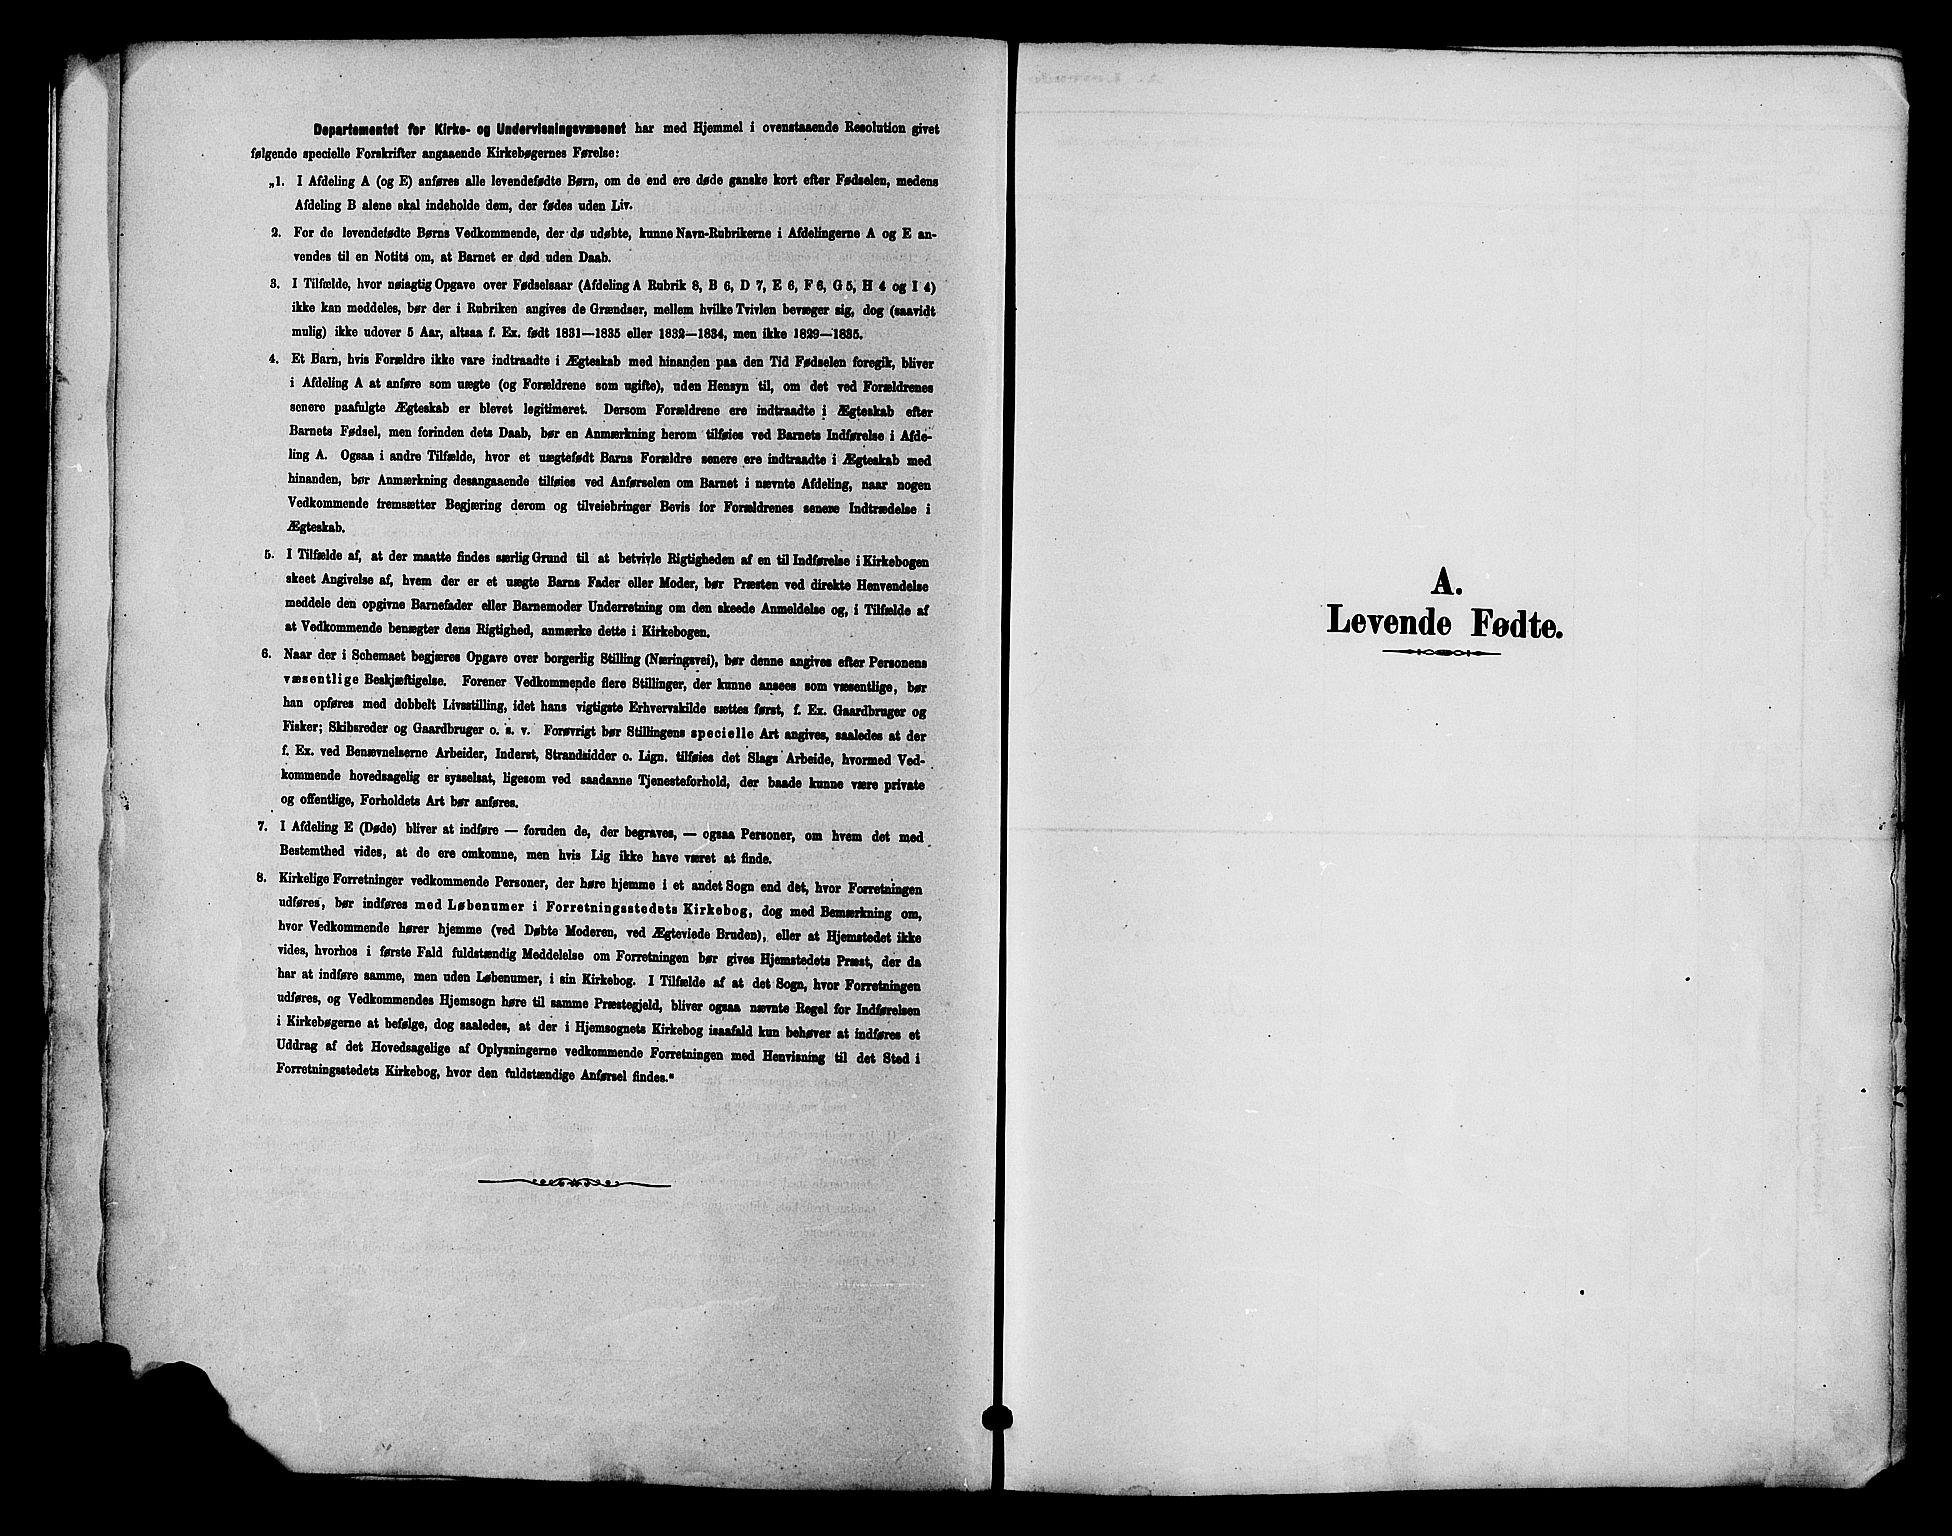 SAH, Lom prestekontor, K/L0008: Ministerialbok nr. 8, 1885-1898